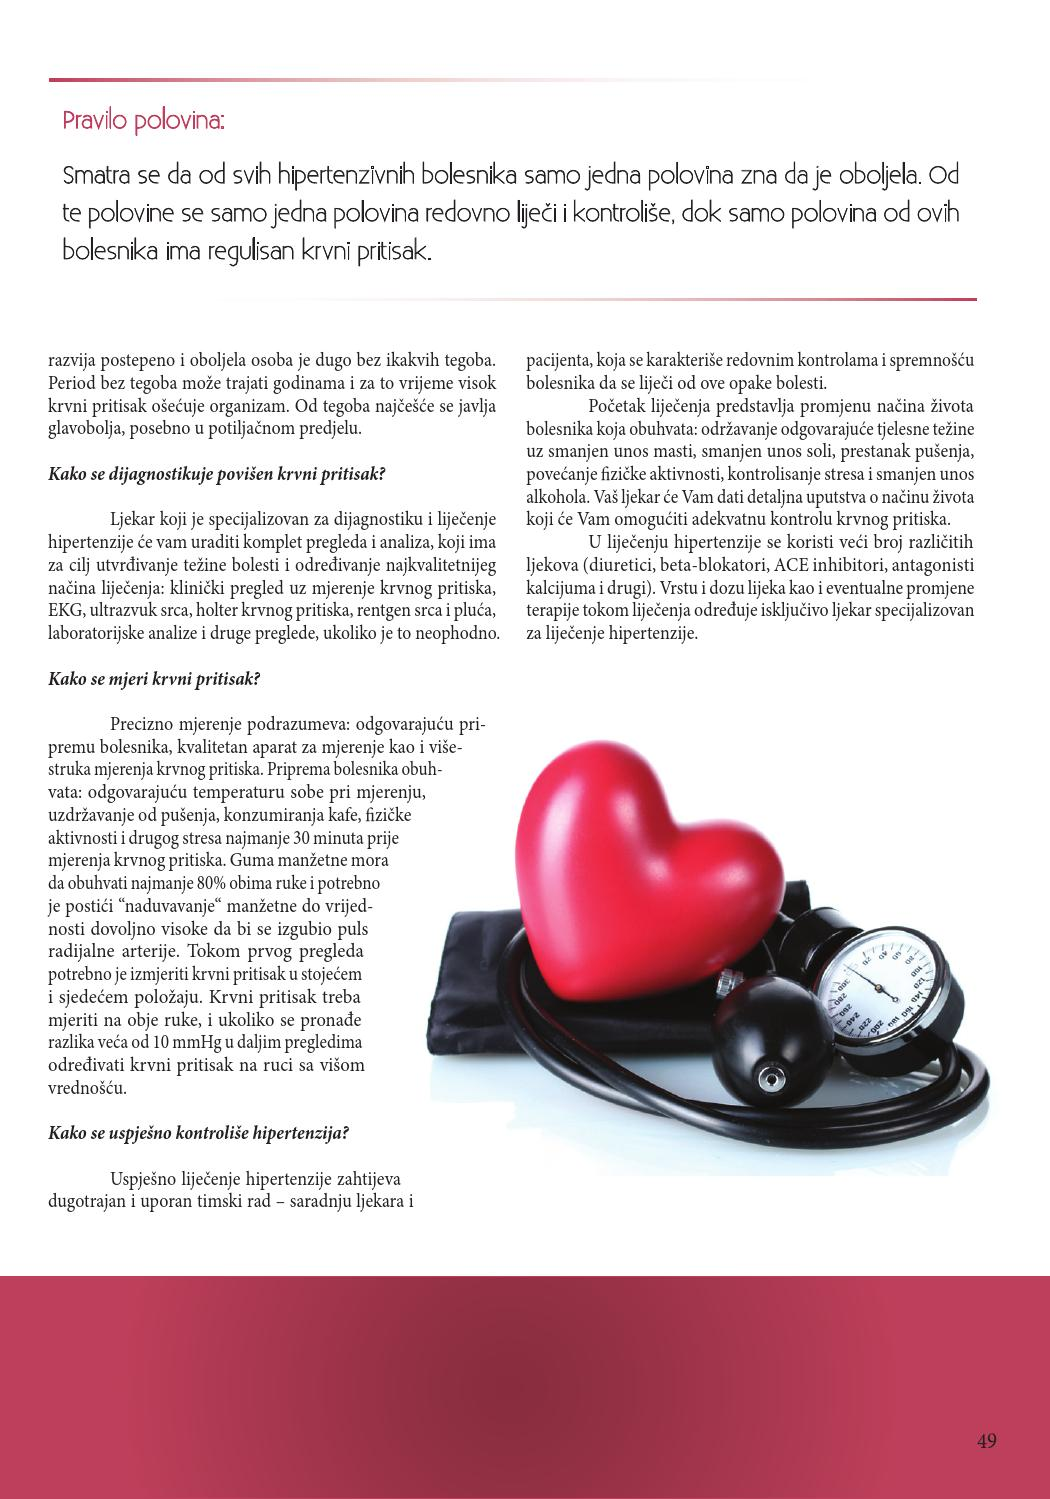 Klinički simptomi hipertenzije